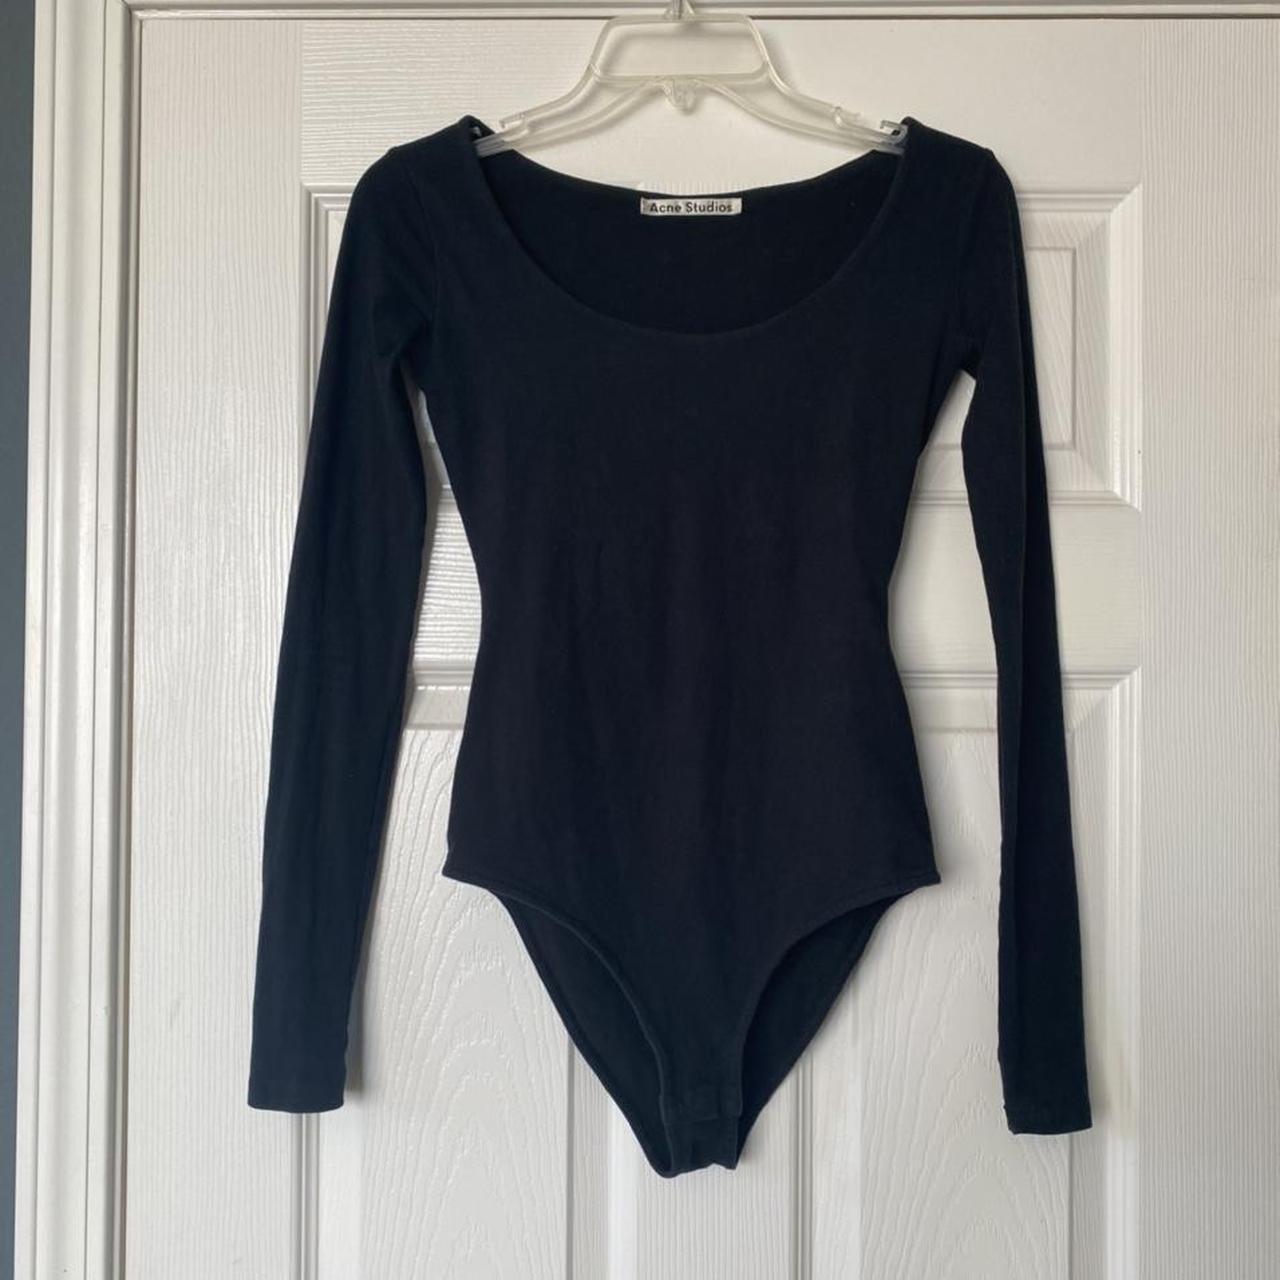 Product Image 1 - Acne Studios scoop neck bodysuit